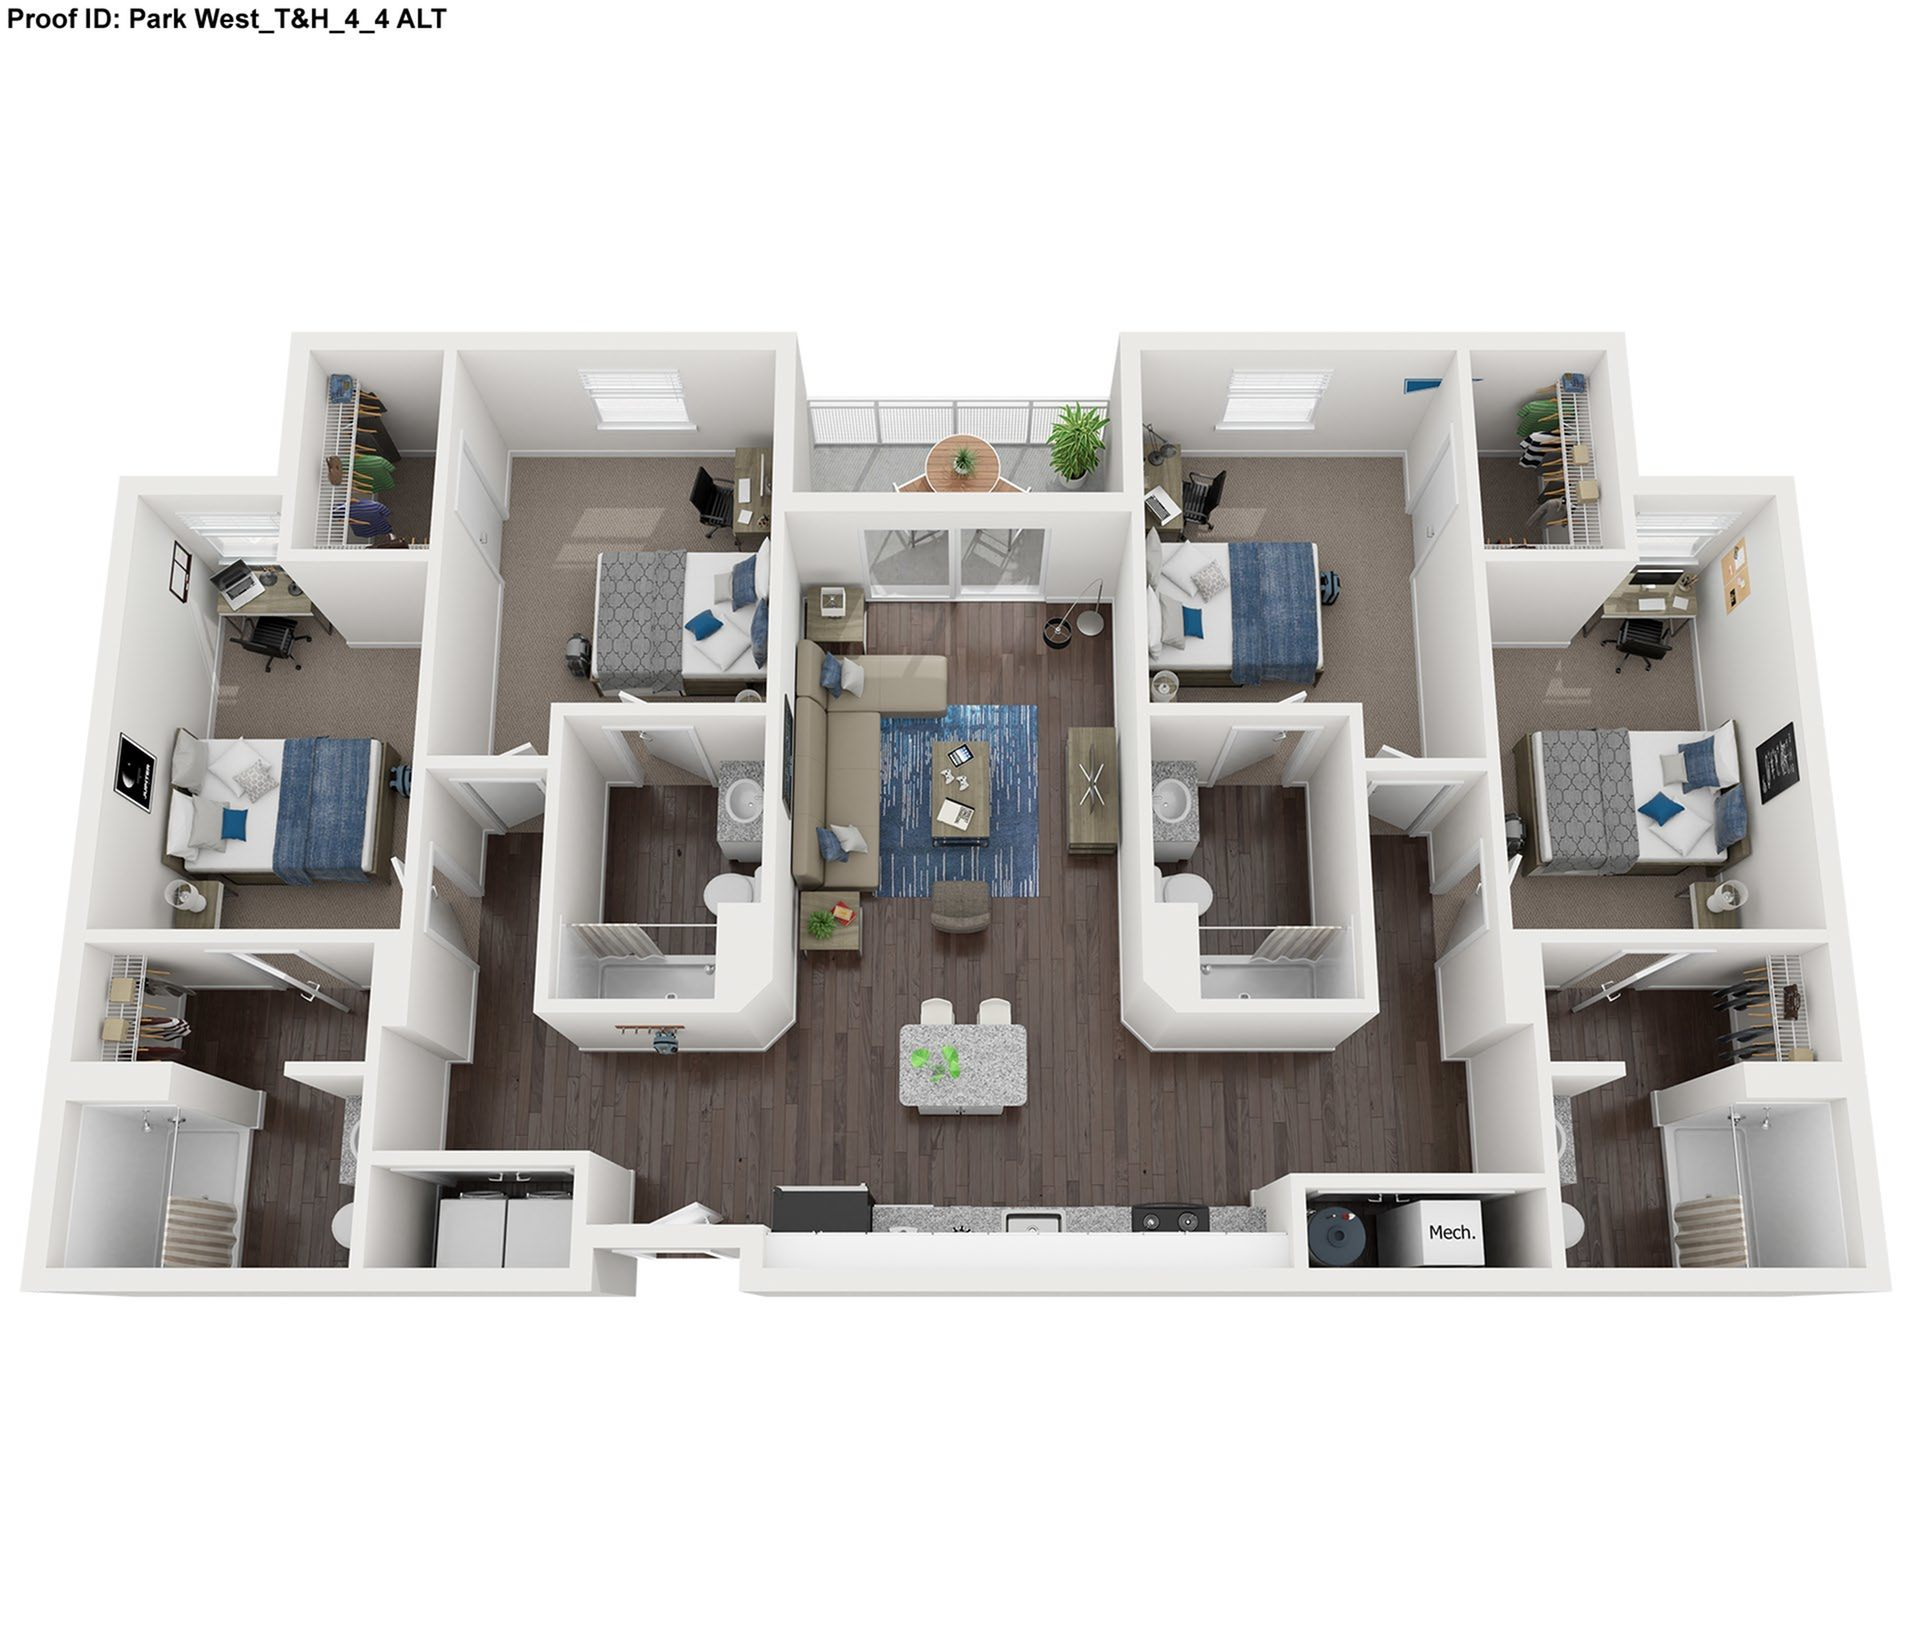 4 Bedroom 4 Bathroom Floor Plan